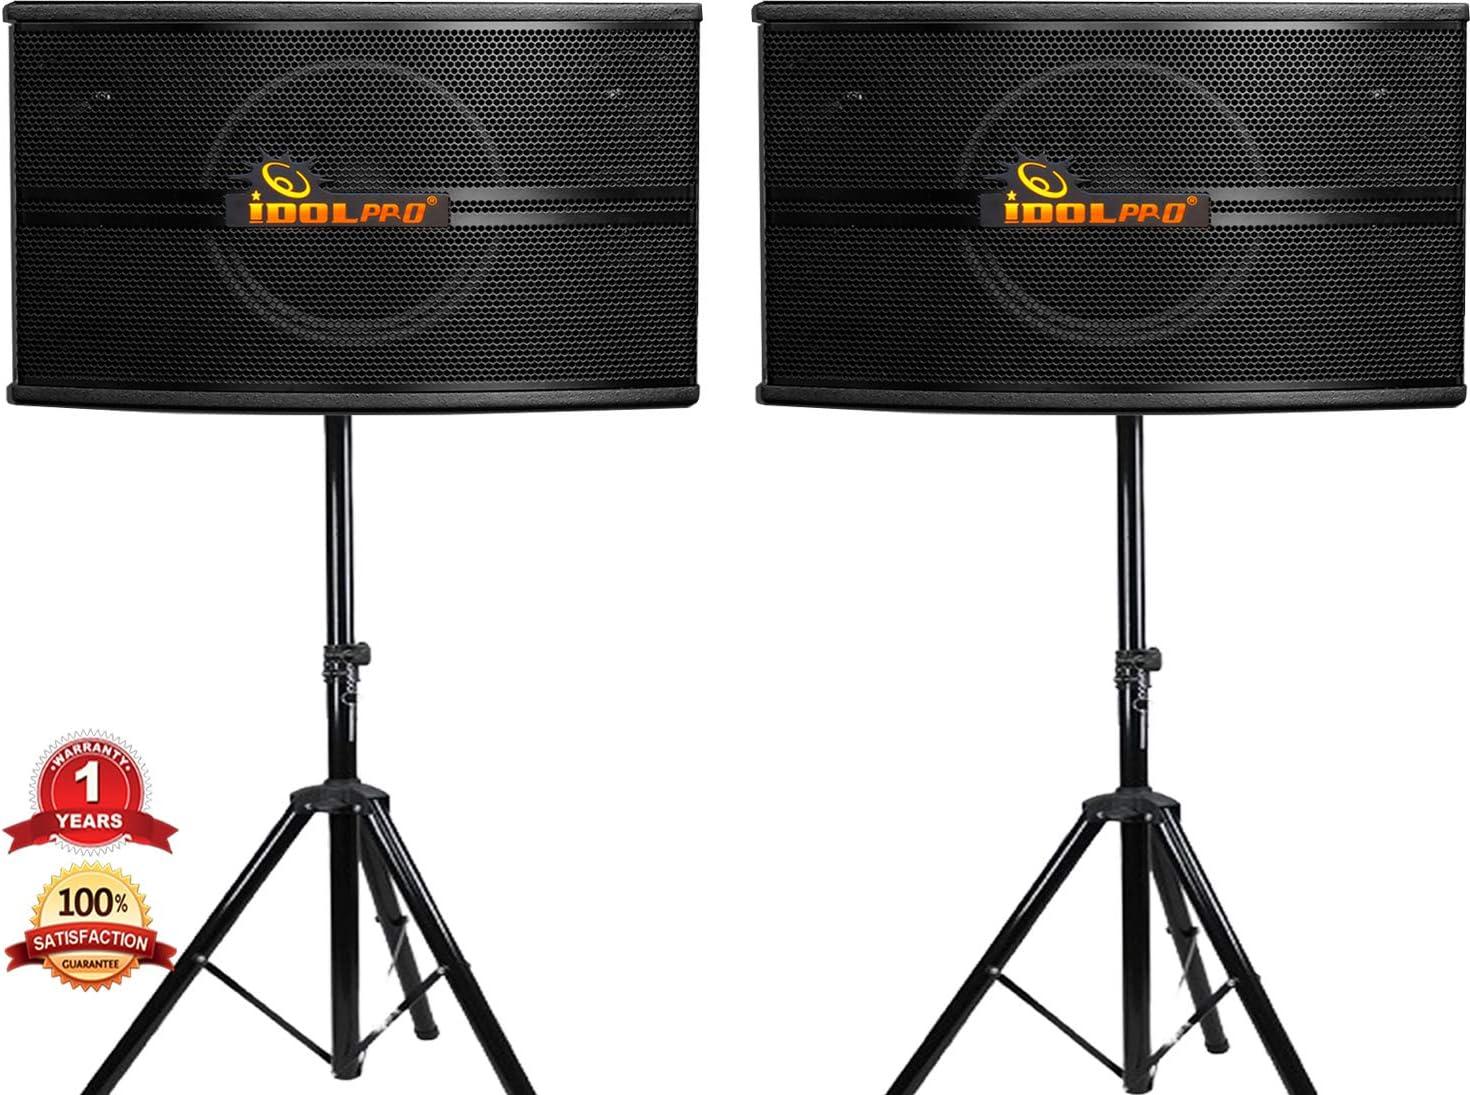 IDOLpro 500W free Professional High Fidelity Vocal Speakers Austin Mall W Karaoke